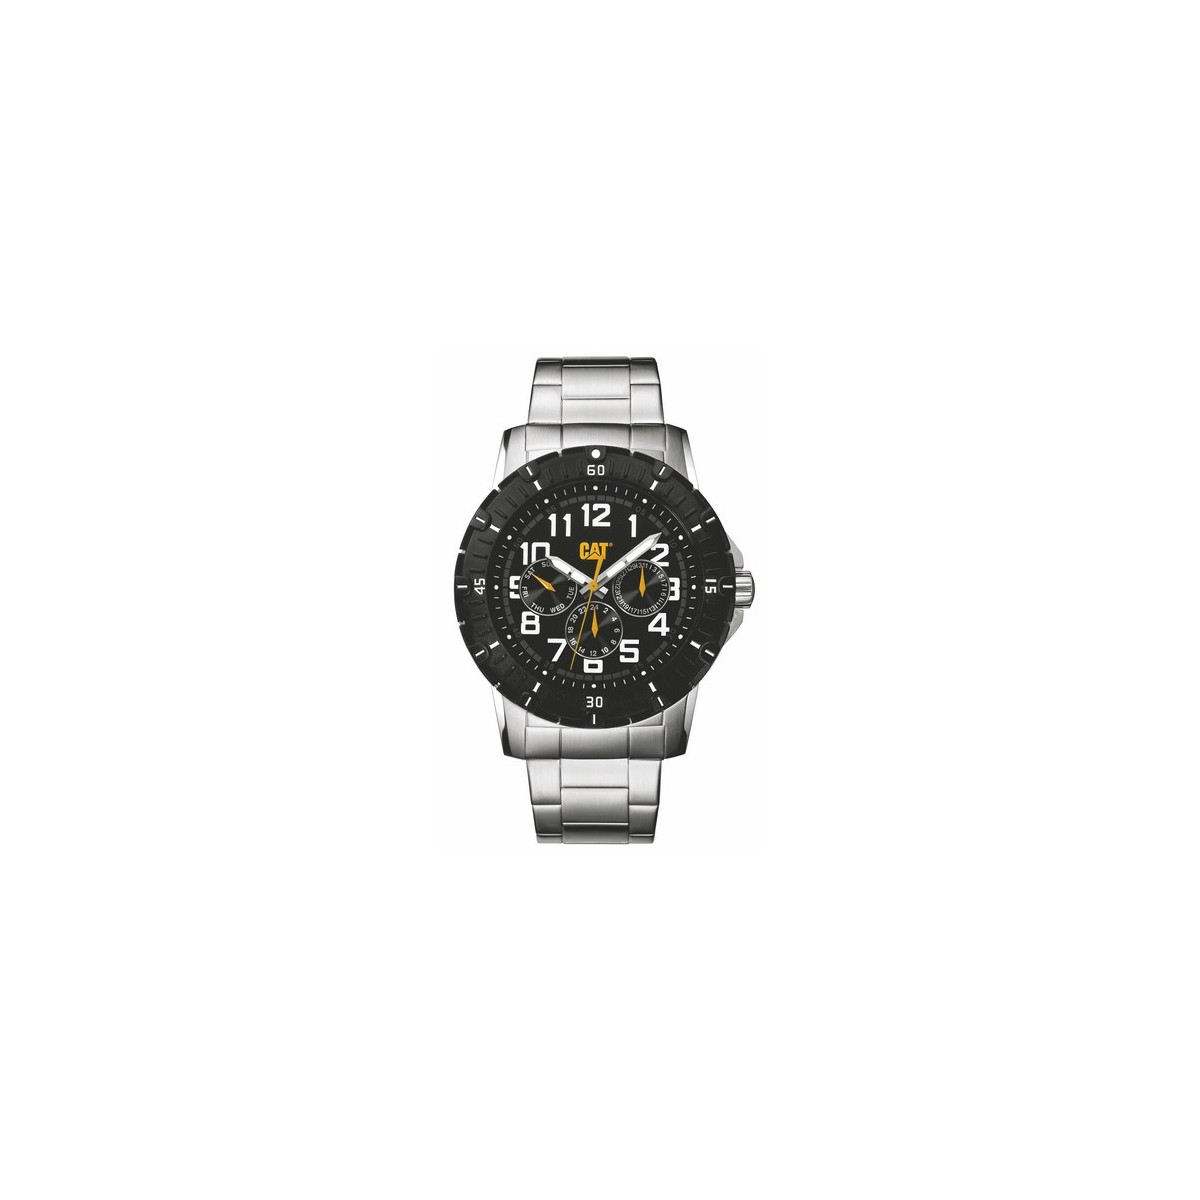 https://www.gaberjoyeria.com/3414-thickbox_default/reloj-caterpillar-hombre.jpg